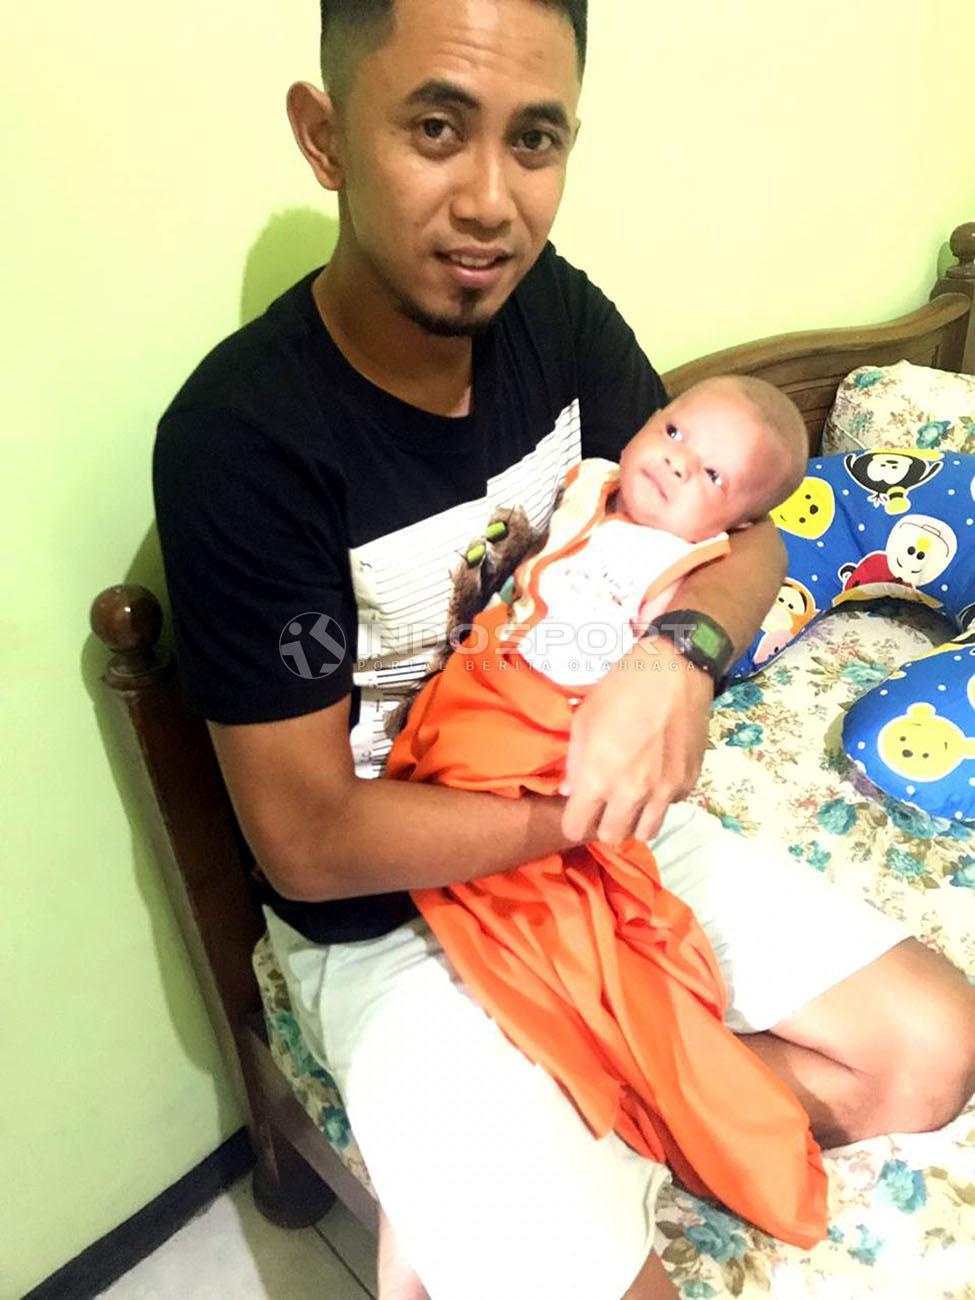 Dua kebahagiaan Kapten PSS Sleman, Muhammad Bagus Nirwanto juga dikaruniai seorang putra di pengujung tahun 2018. Copyright: Ronald Seger/Indosport.com